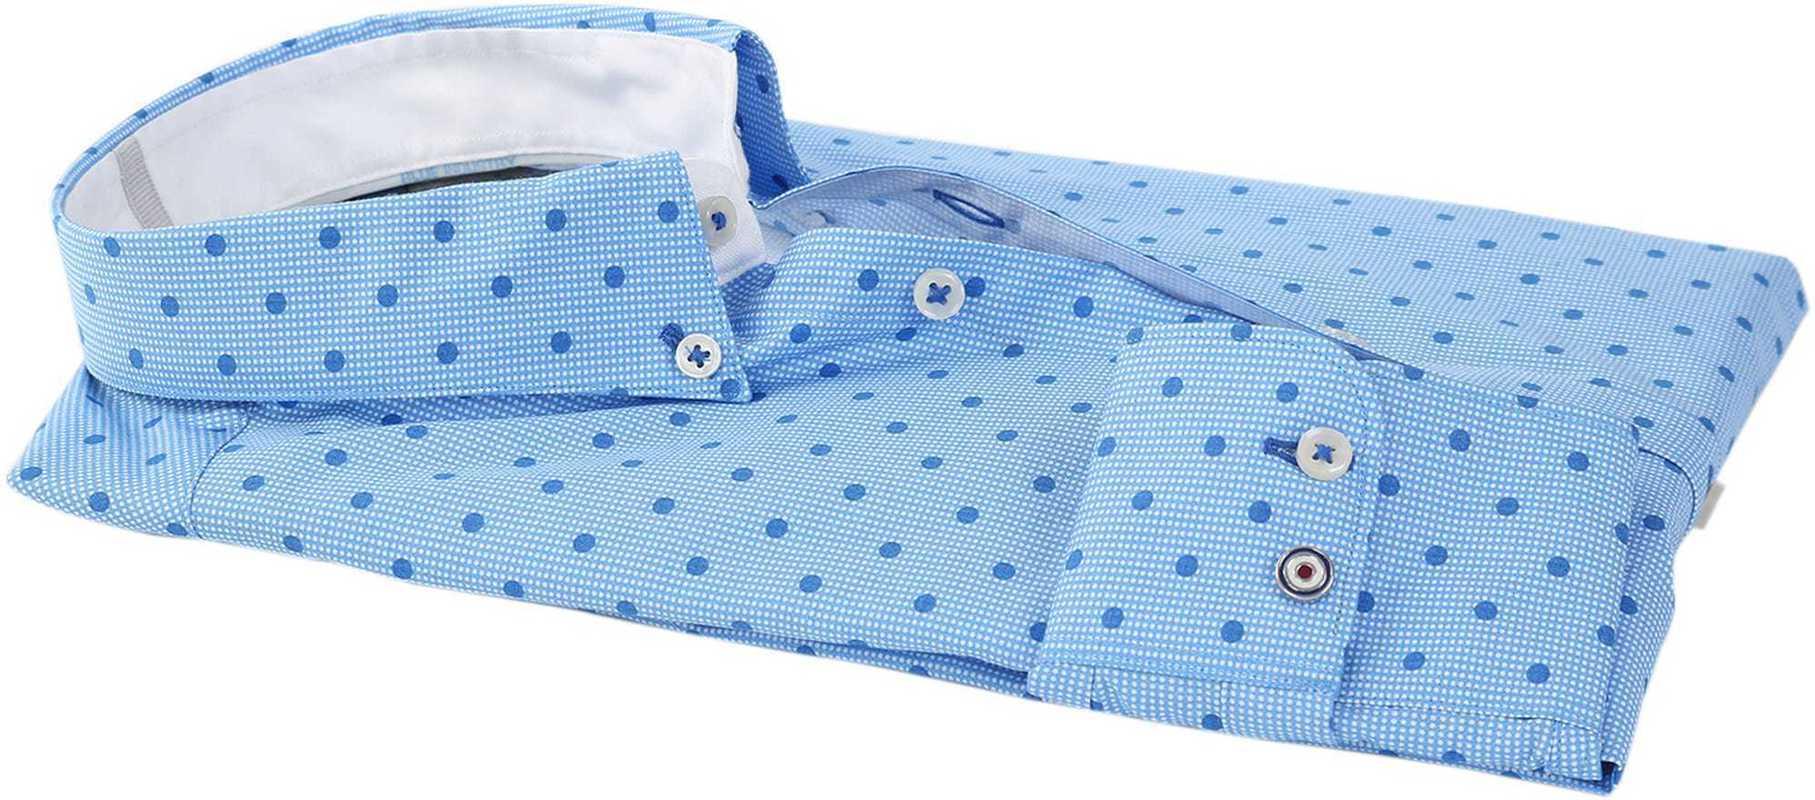 Detail Blue Industry Shirt Blauwe Print